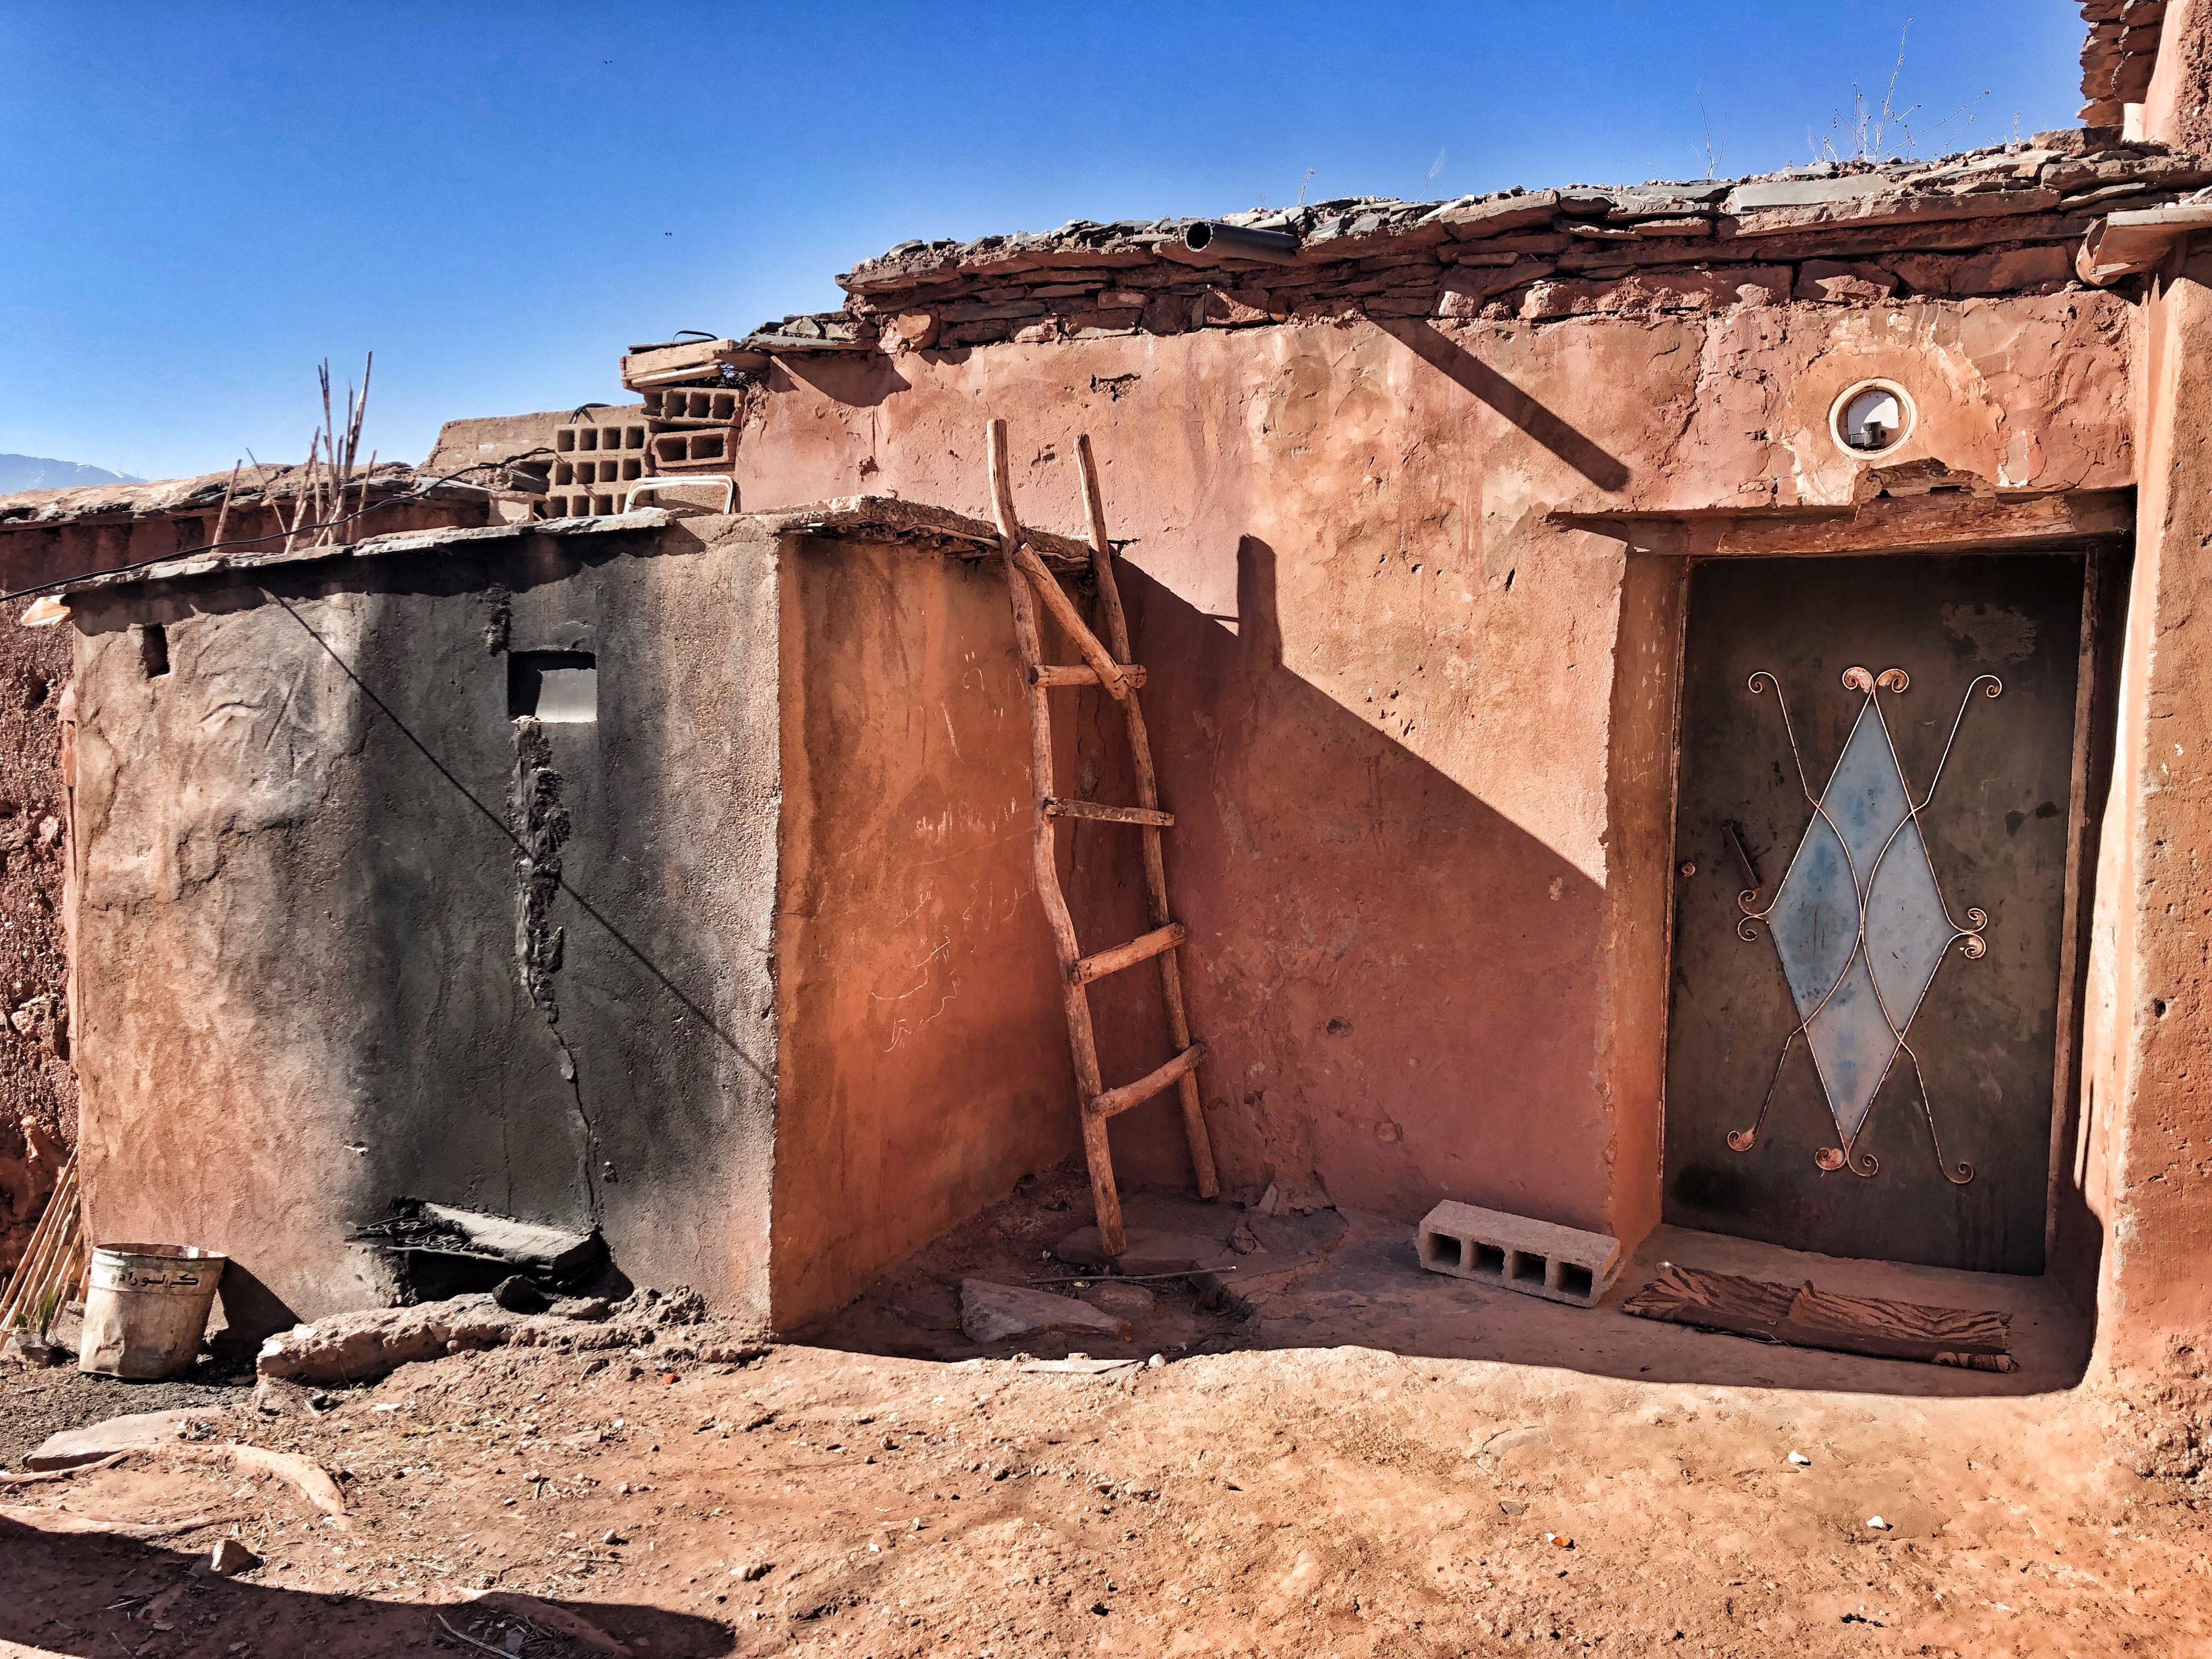 Ein Simple Haus Aus Lehm In Marokko Marokko Reisen Marrakesch Marokko Marokko Karte